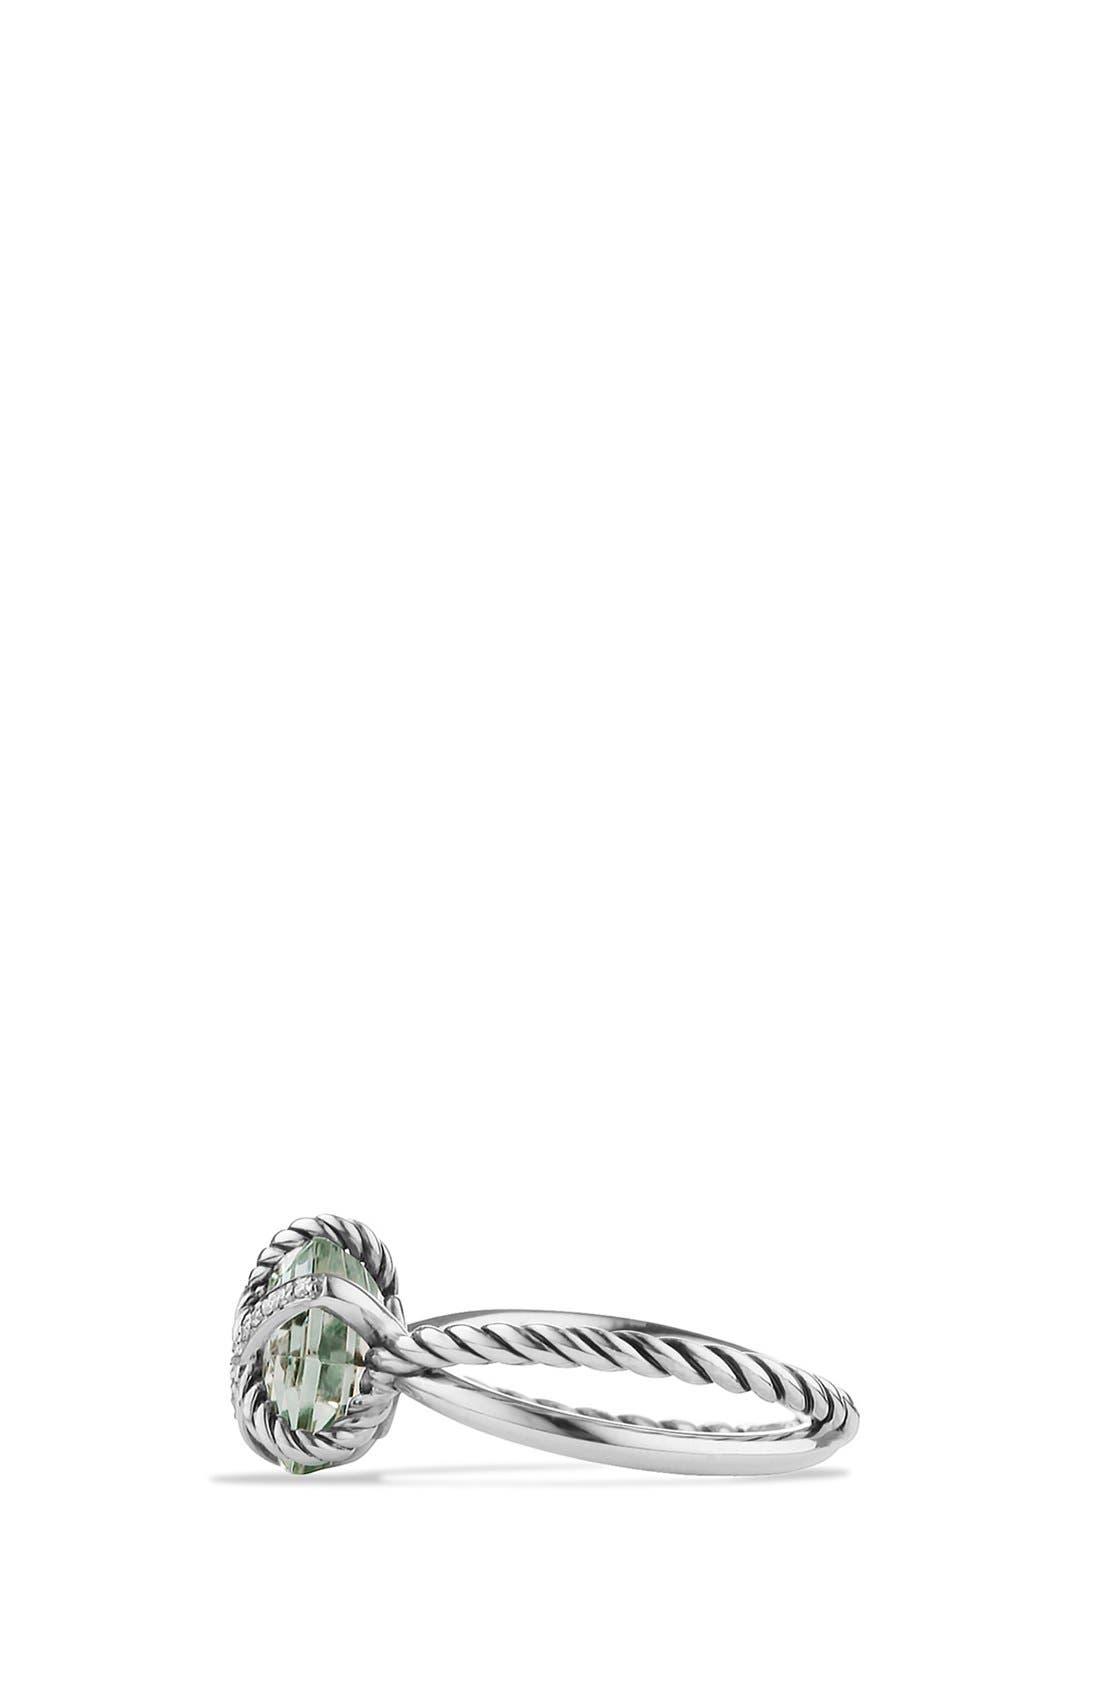 Alternate Image 3  - David YurmanCable Wrap Ring with Semiprecious Stone andDiamonds